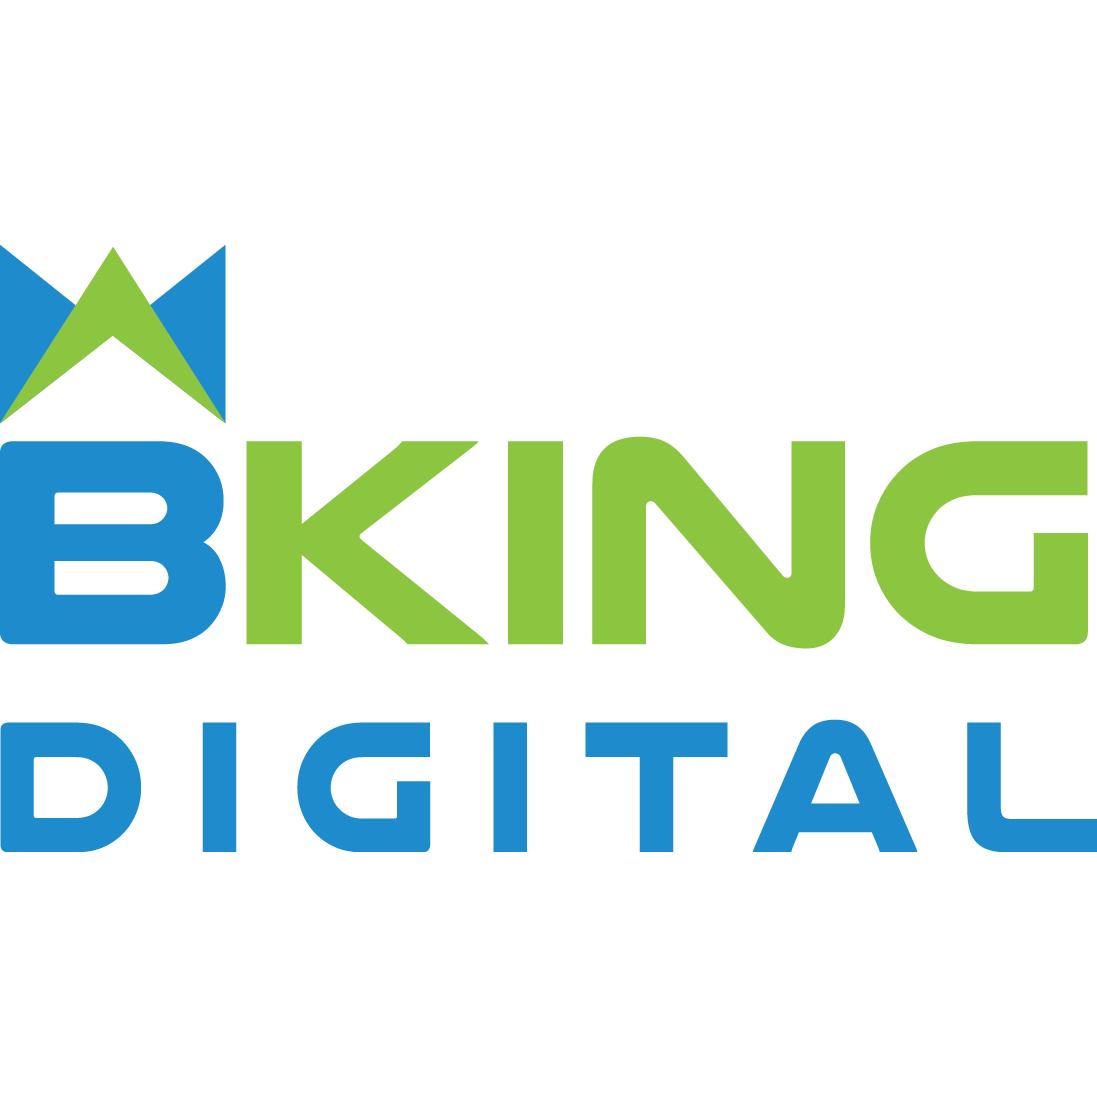 B King Digital image 2